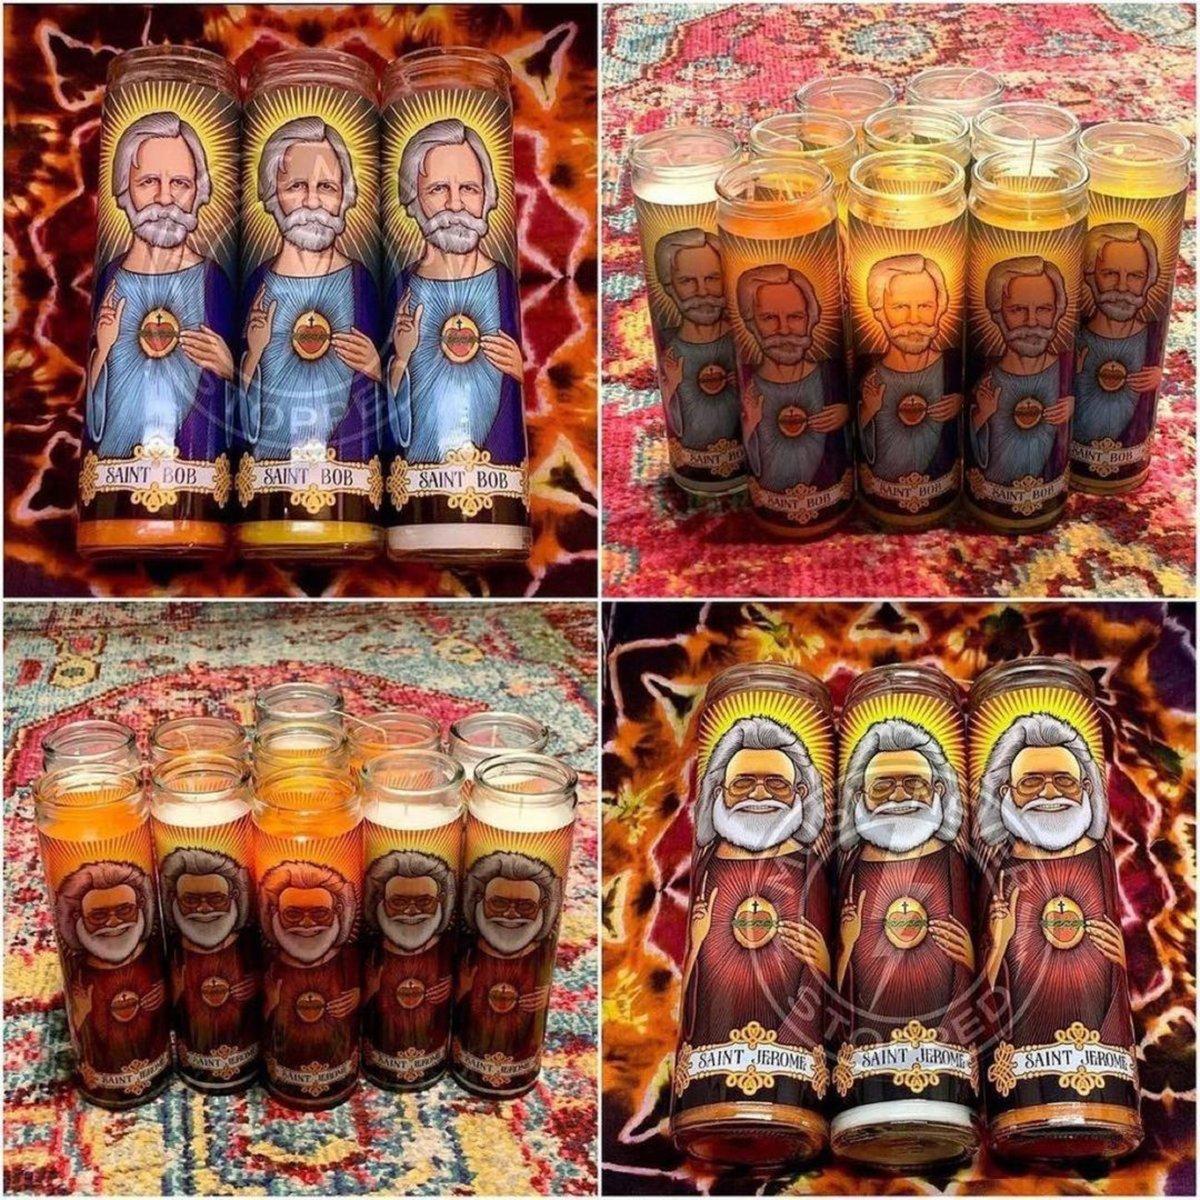 Saint Jerome & Saint Bob Prayer Candles!